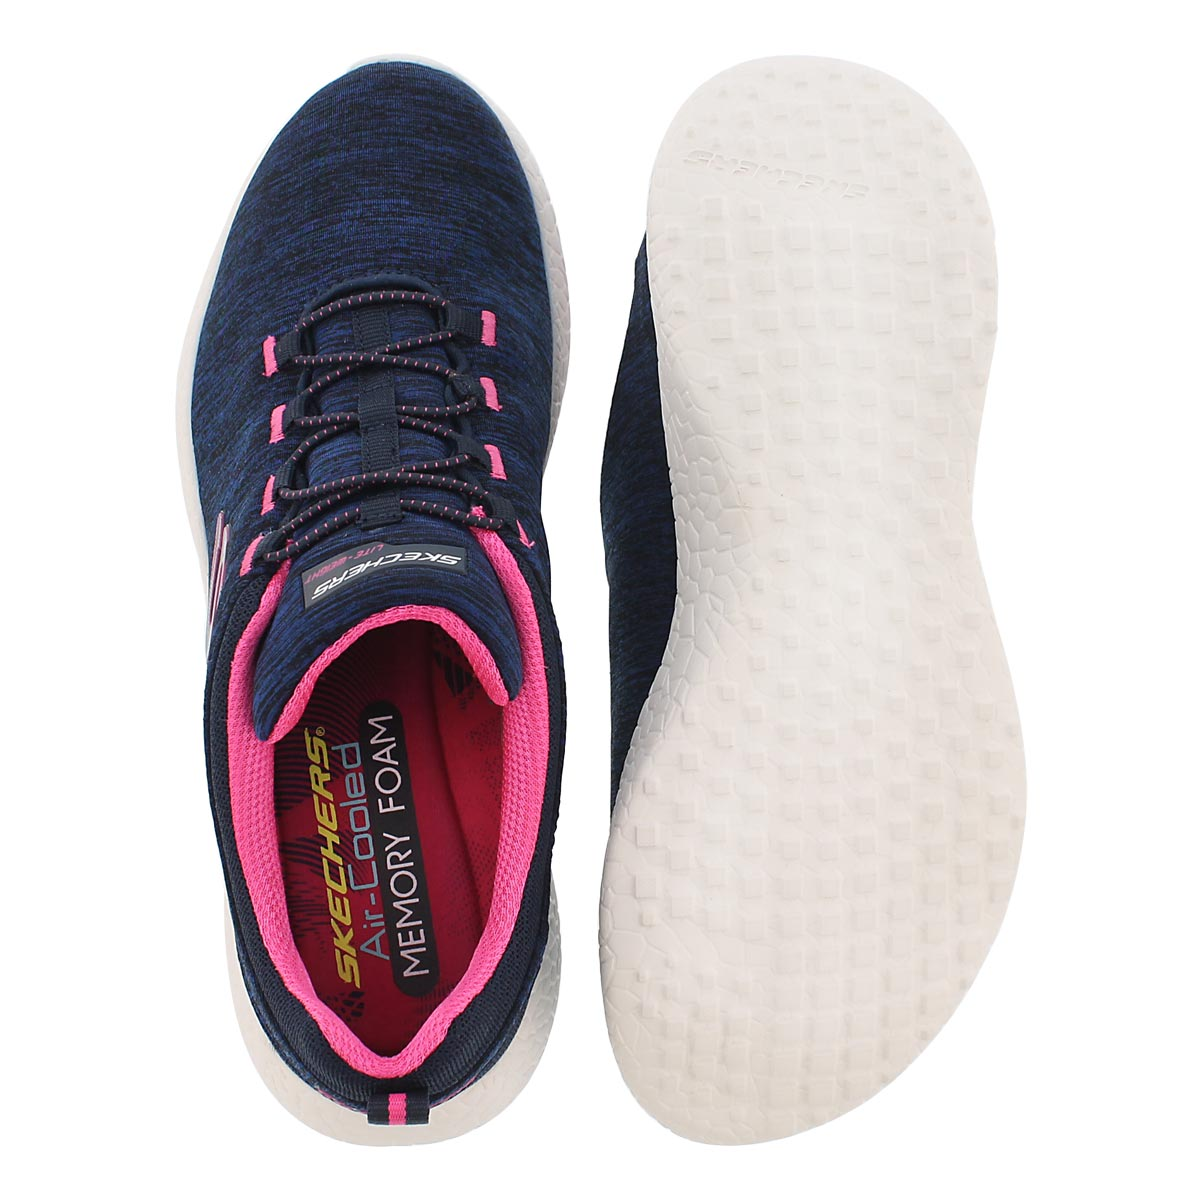 Lds Equinox nvy/pnk bungee running shoe